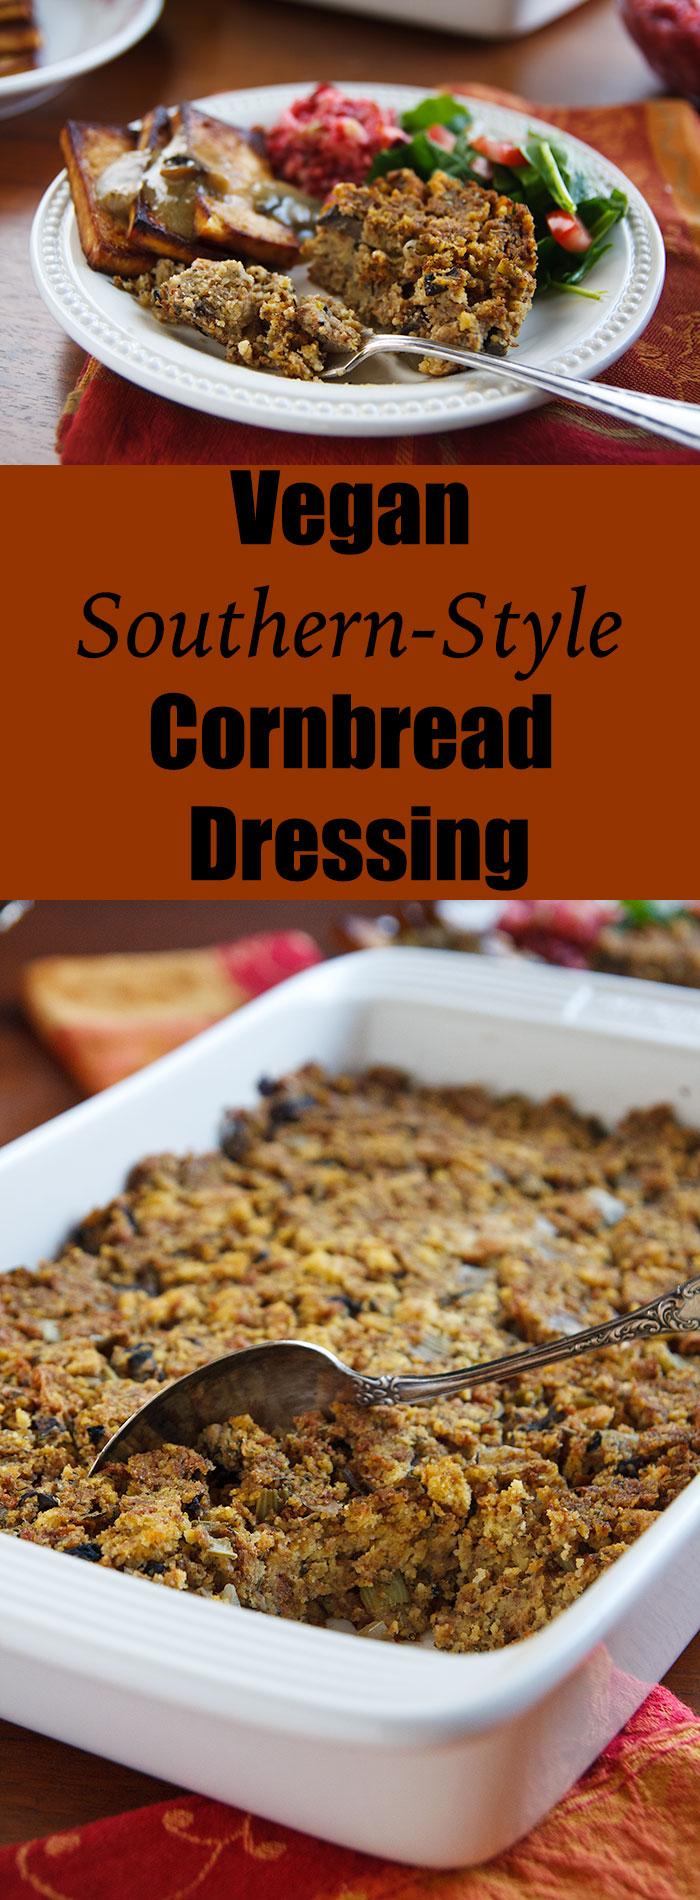 Vegan Southern-Style Cornbread Dressing | FatFree Vegan Kitchen